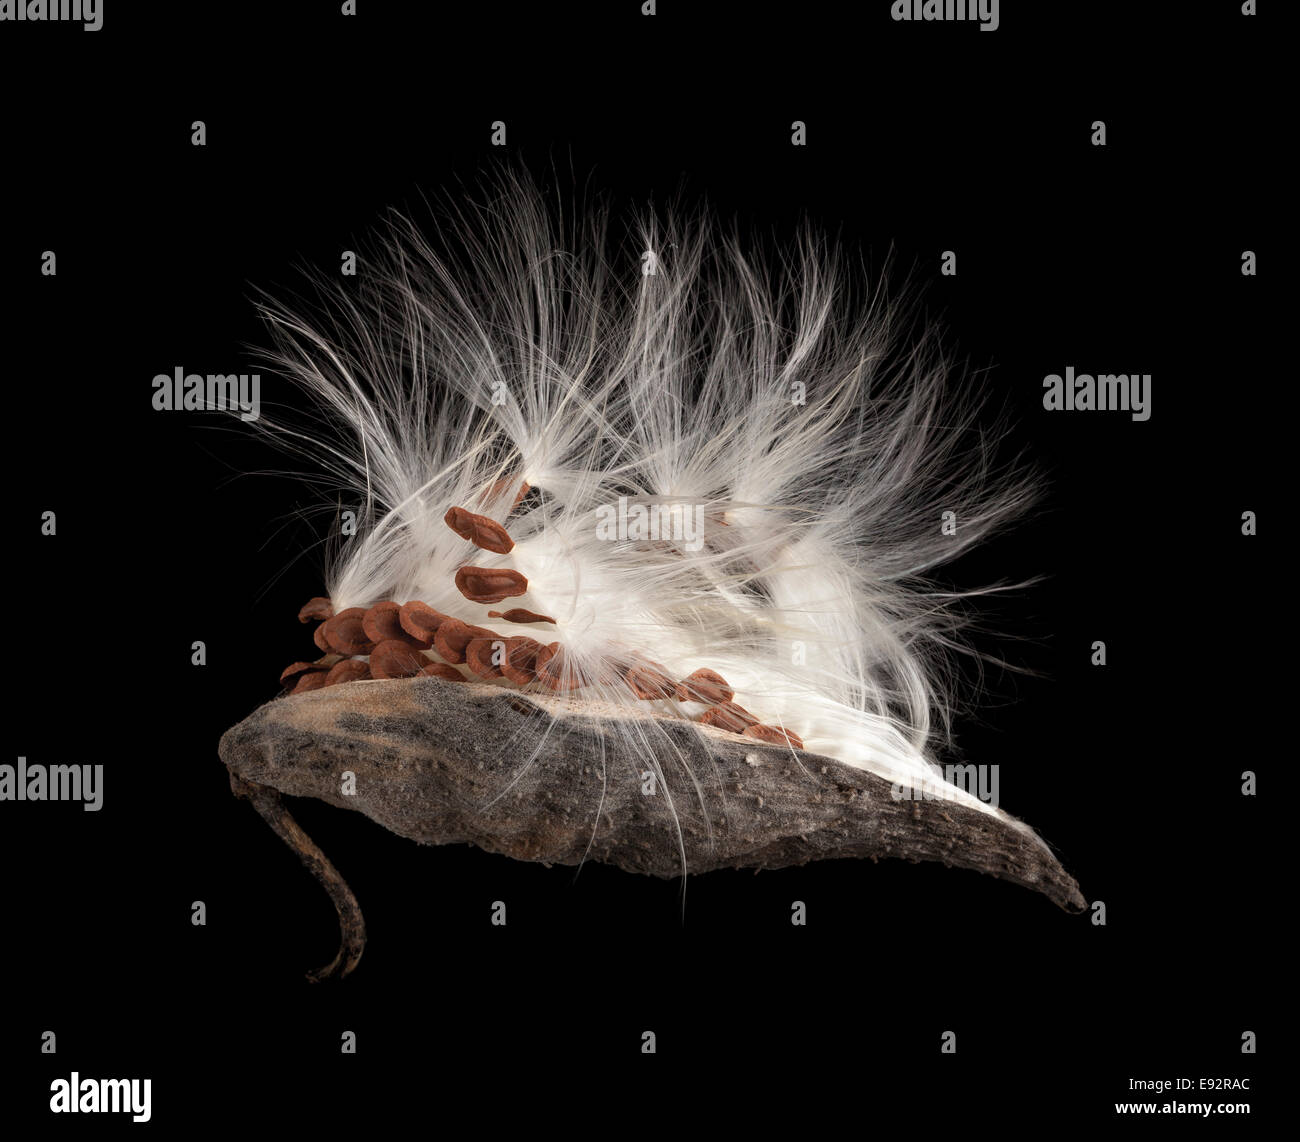 Milkweed seed pod releasing seeds. On a dark background - Stock Image